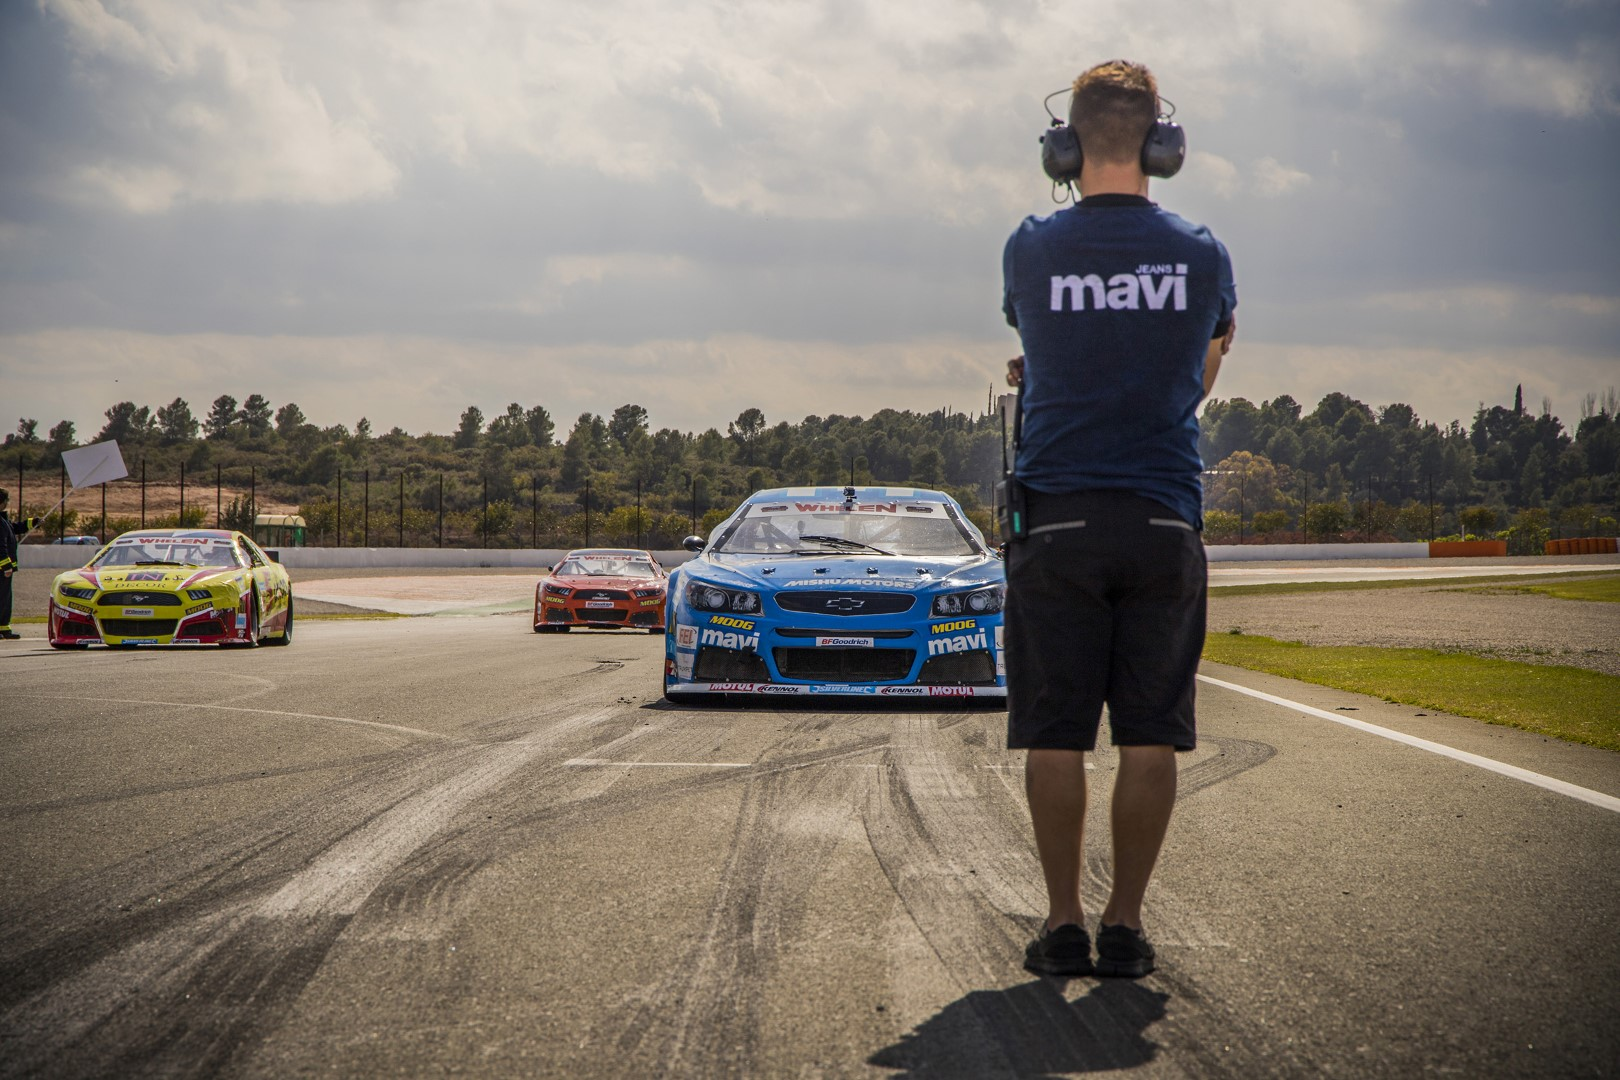 MAVI X NASCAR jetzt im coolen Rennfahrer Look mit Mavi Jeans